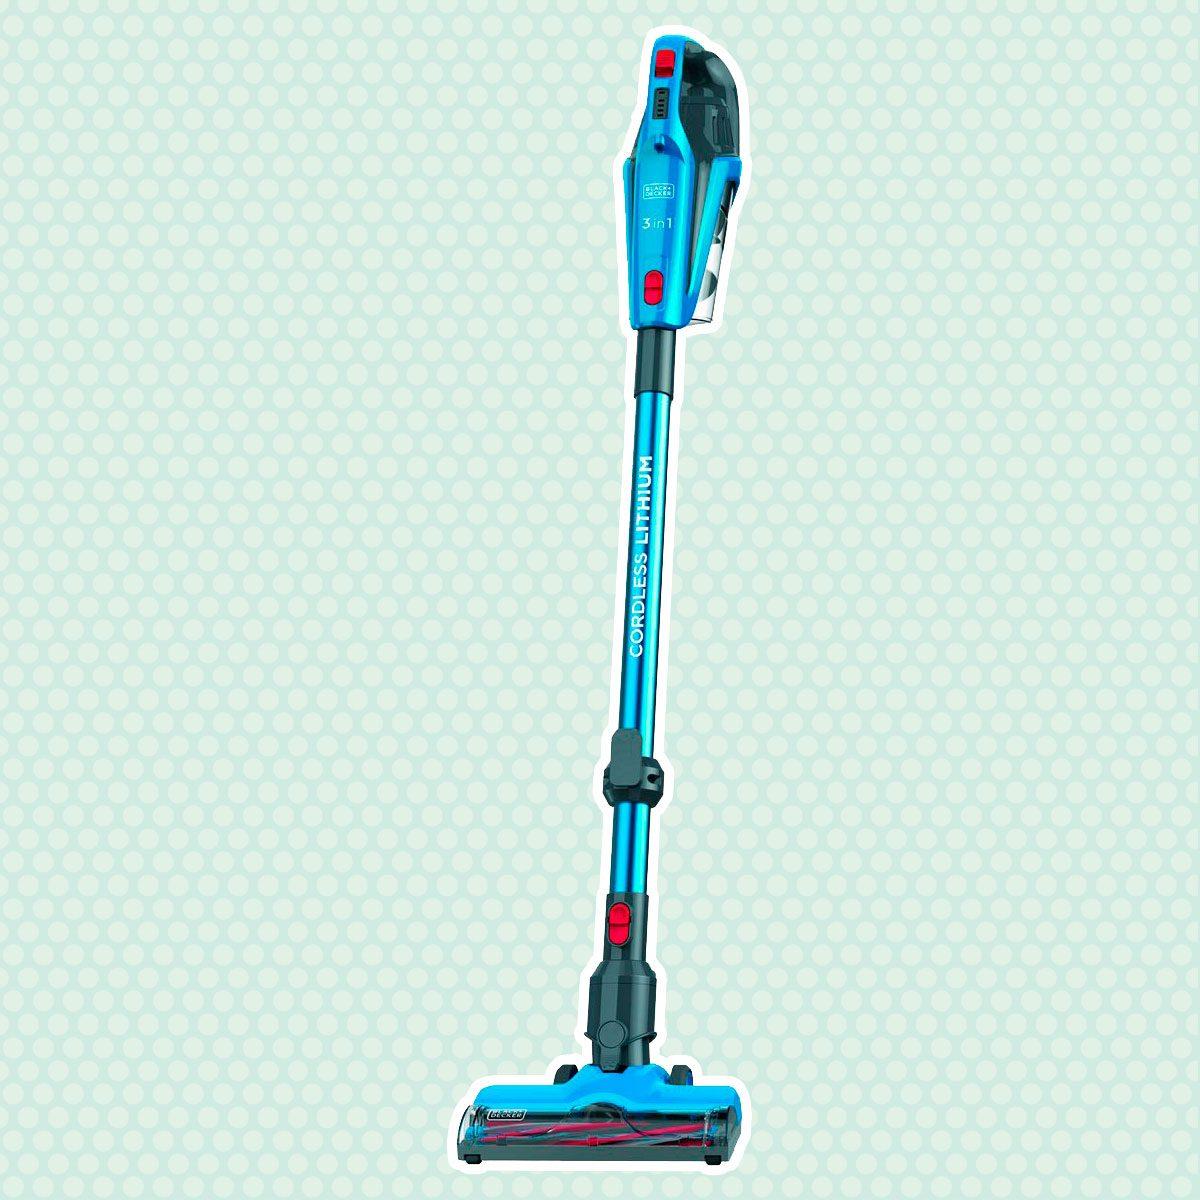 3-N-1 Cordless Stick Vacuum